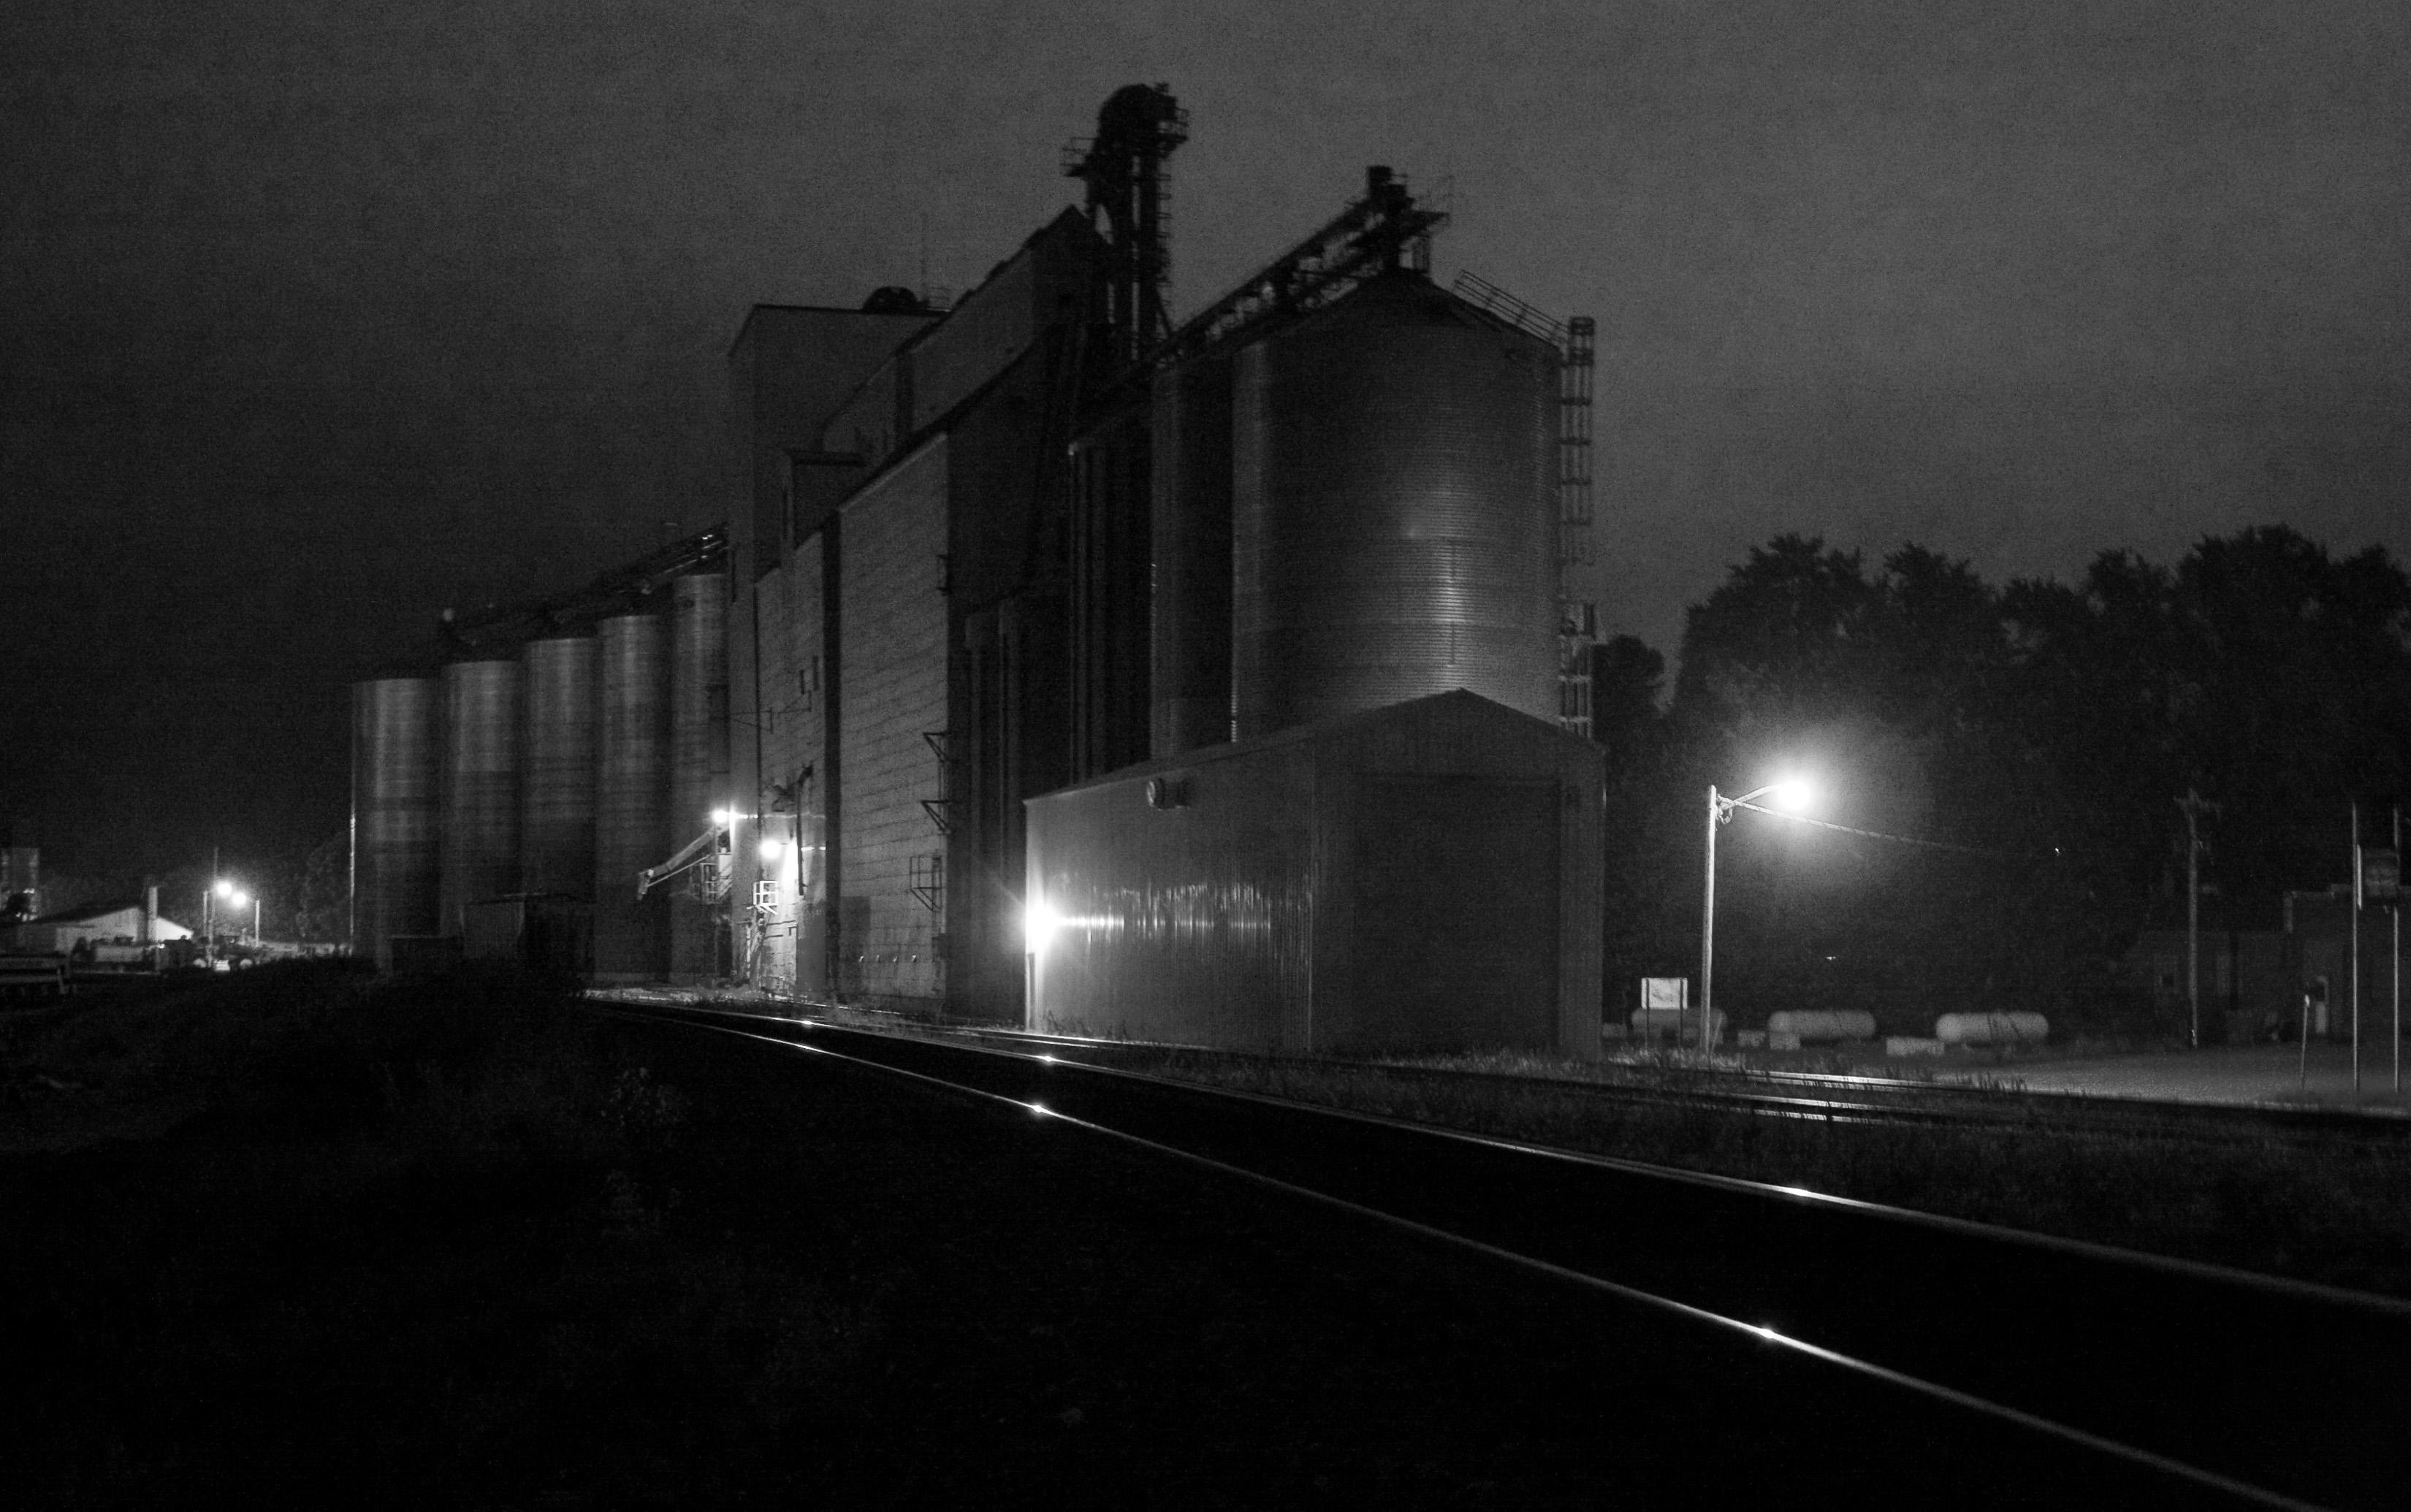 File:Silos in the dark.jpg - Wikimedia Commons